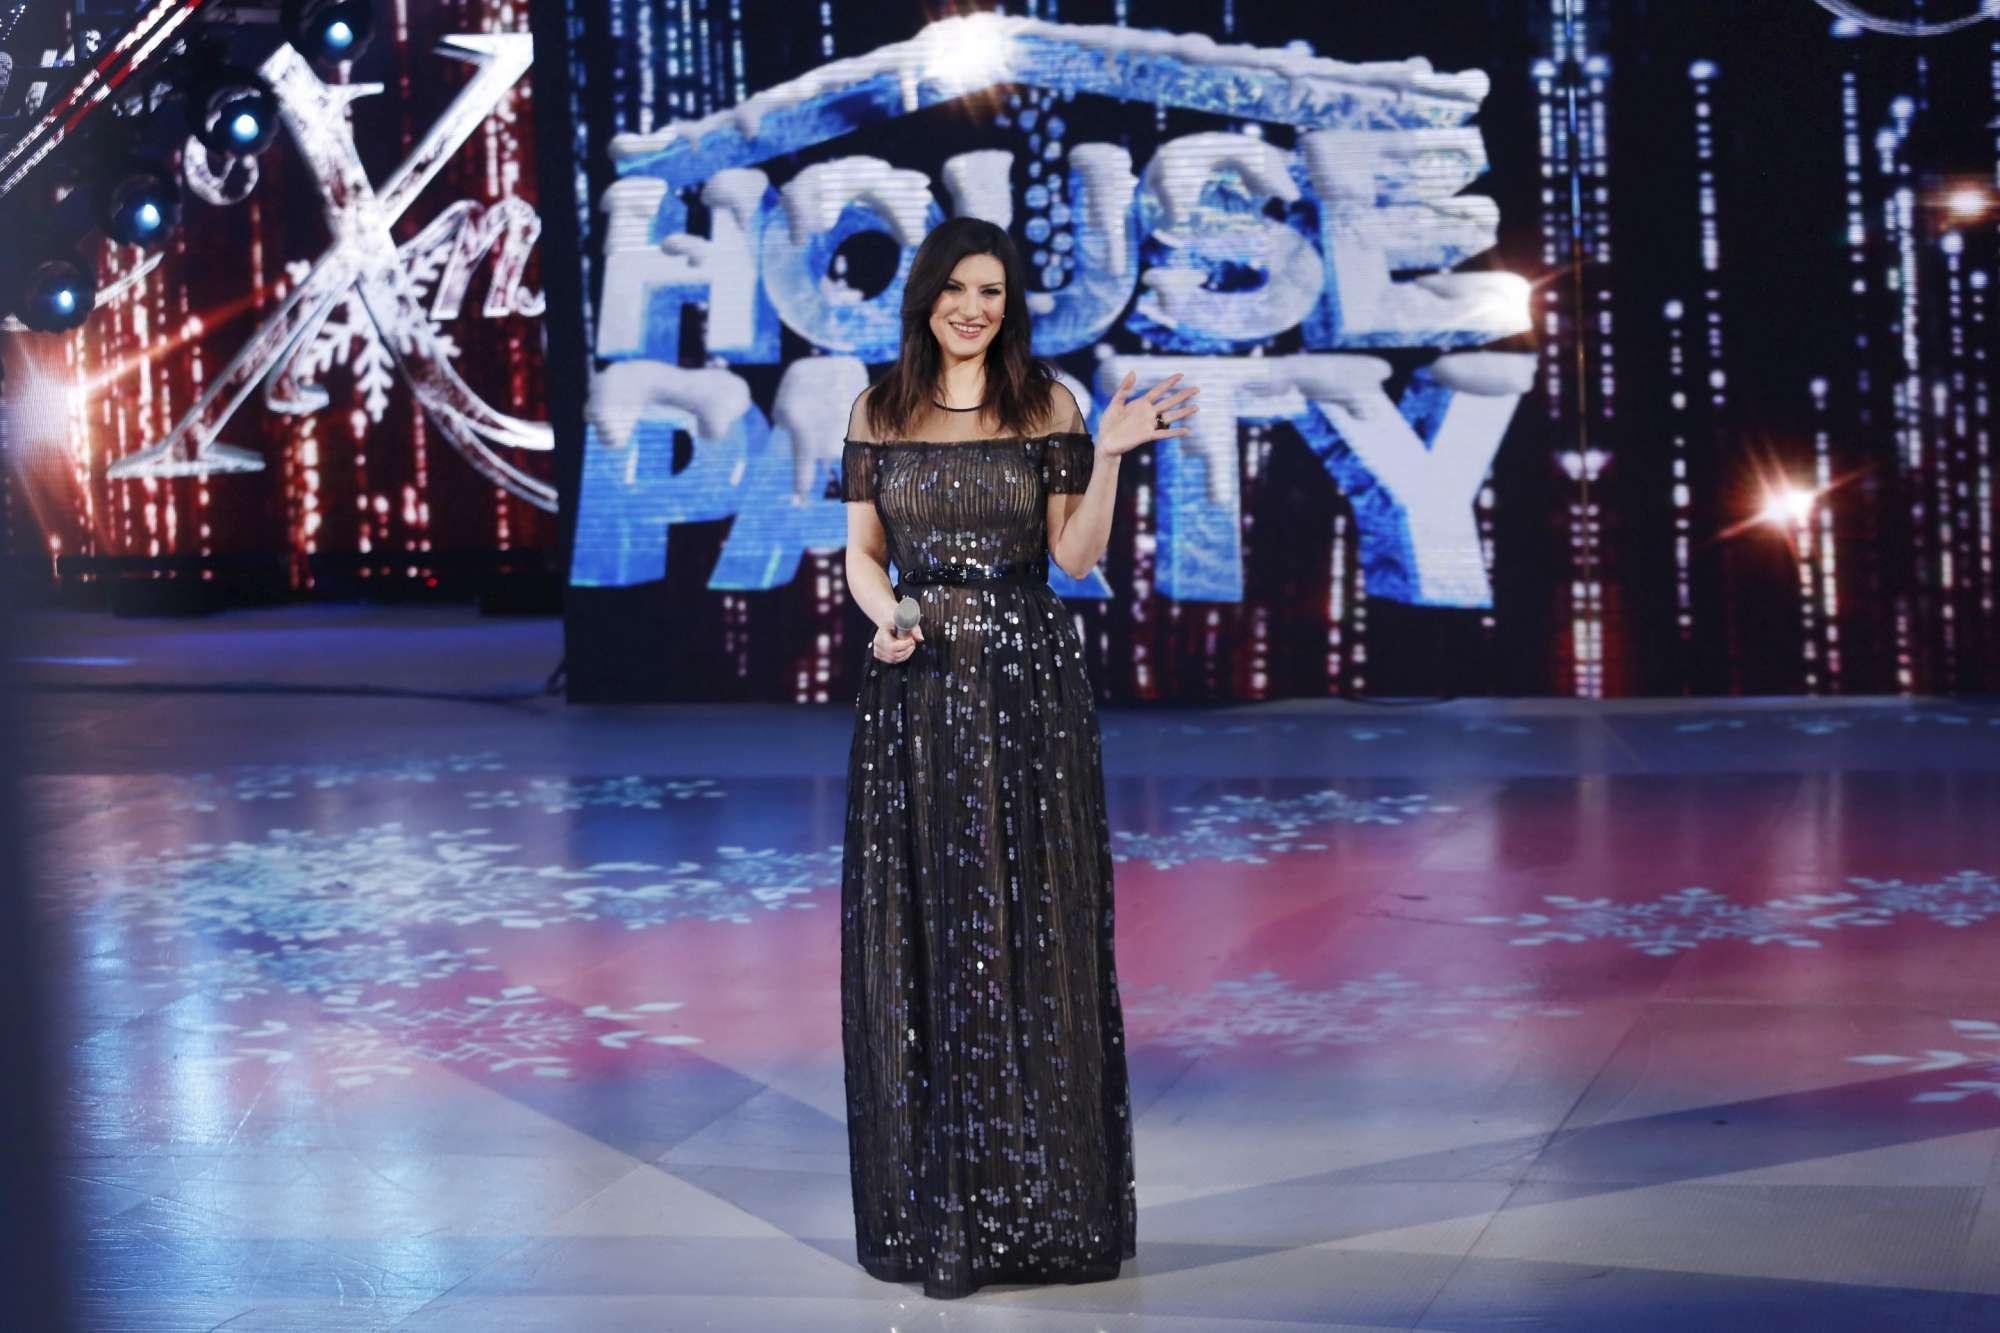 Laura Pausini star di Canale 5